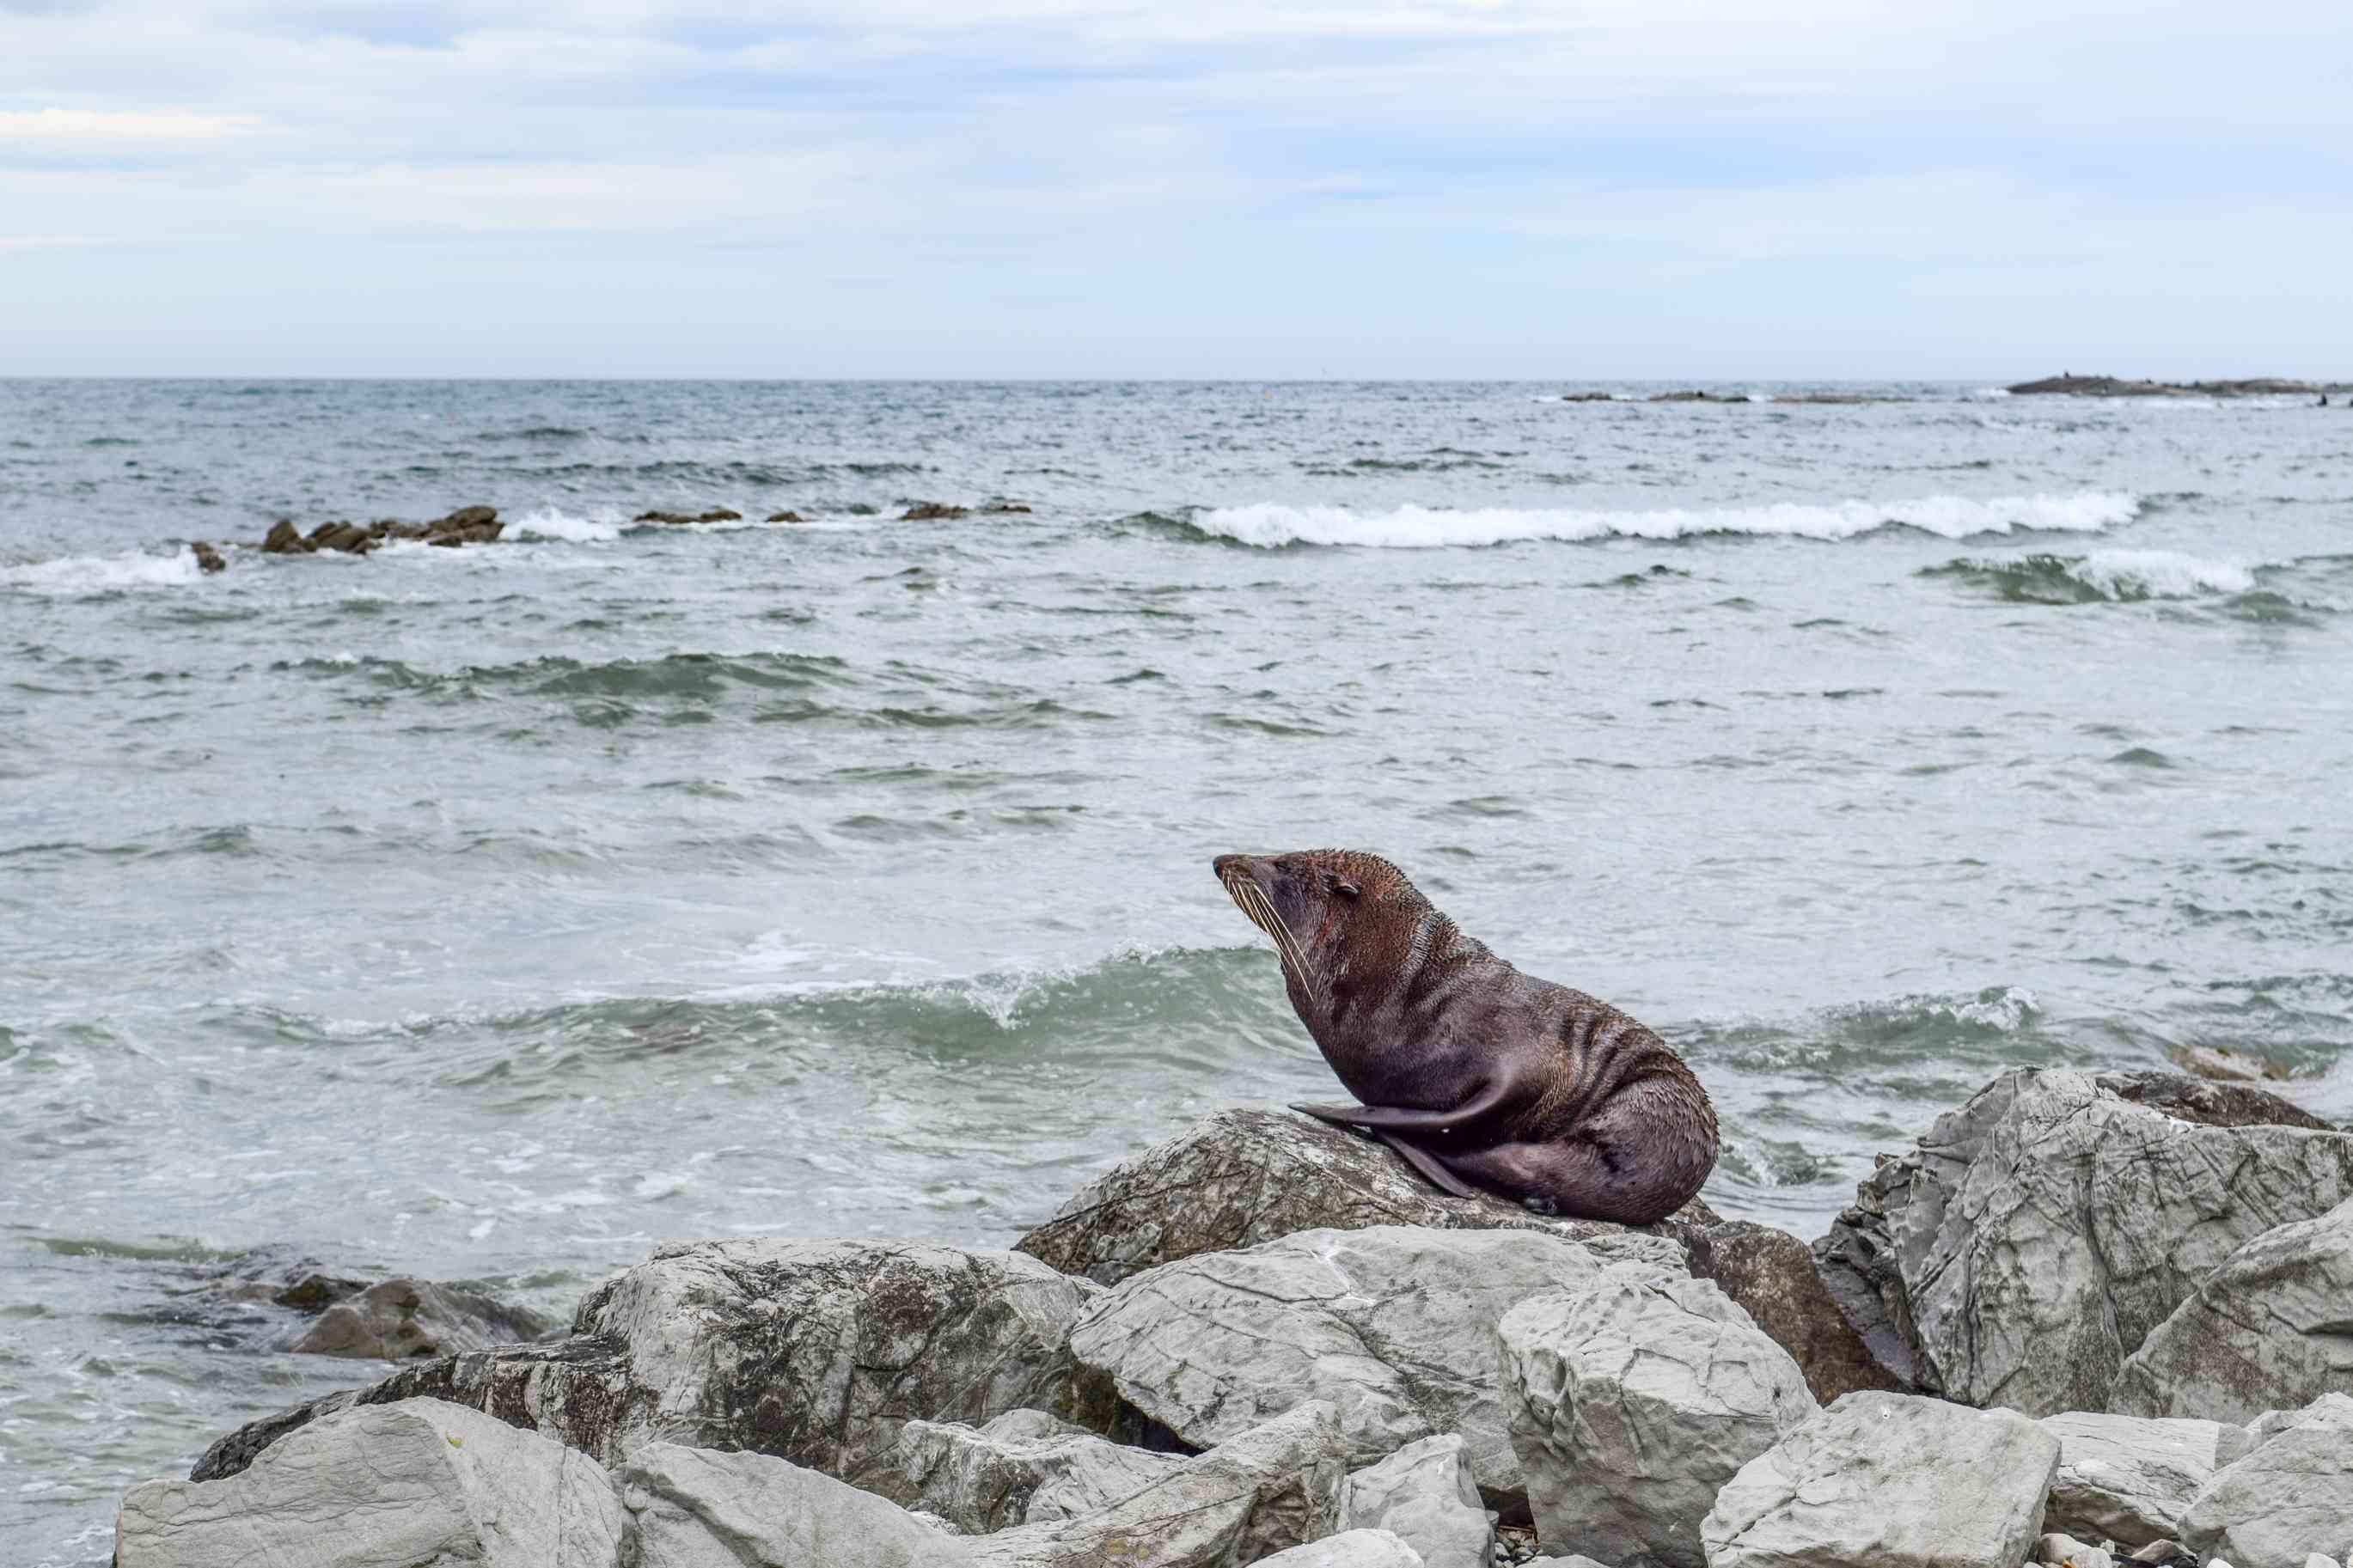 A seal sitting on rocks on the beach in Kaikoura